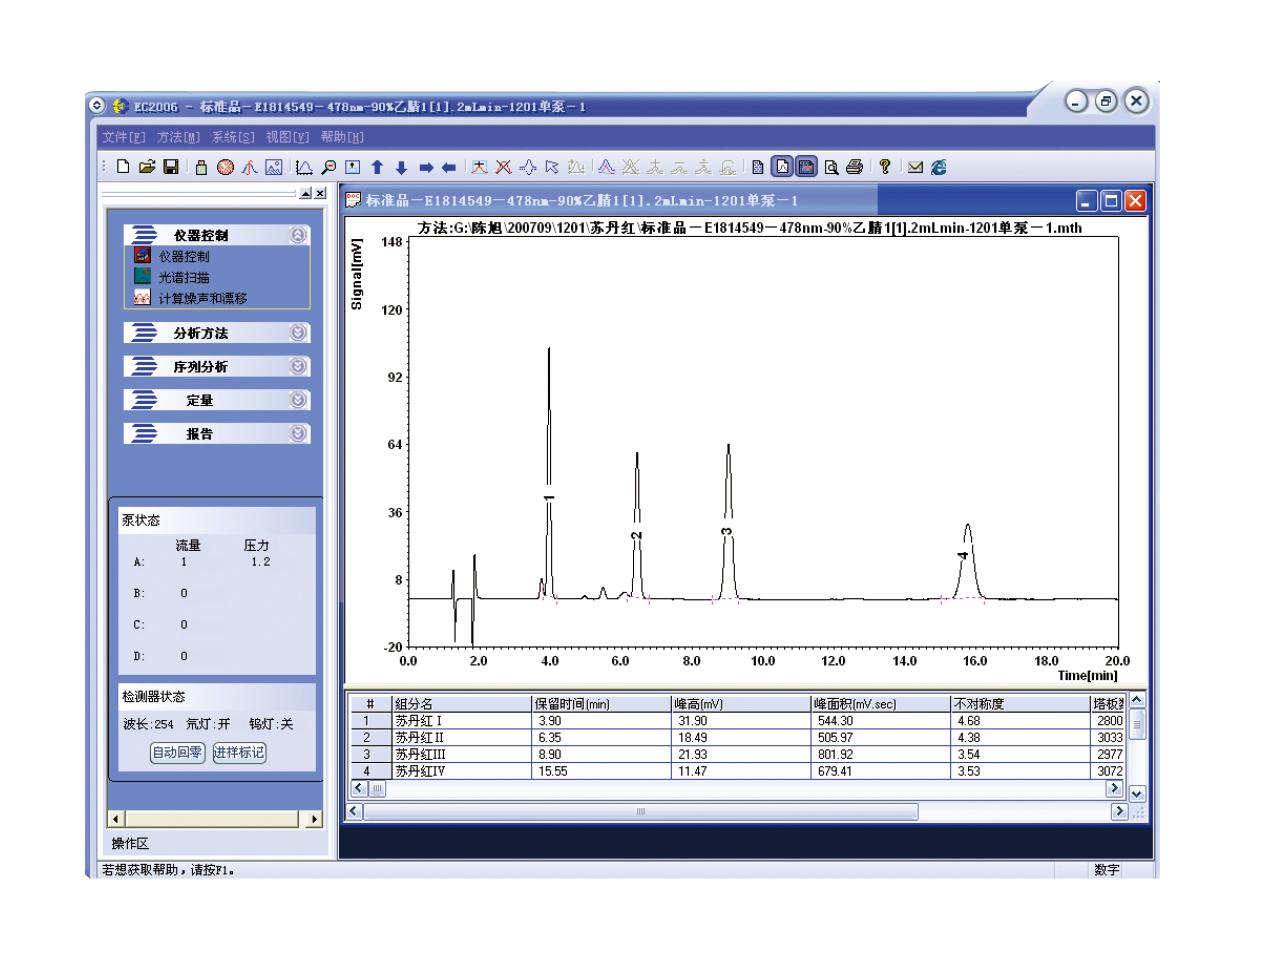 P1201高效液相色谱仪